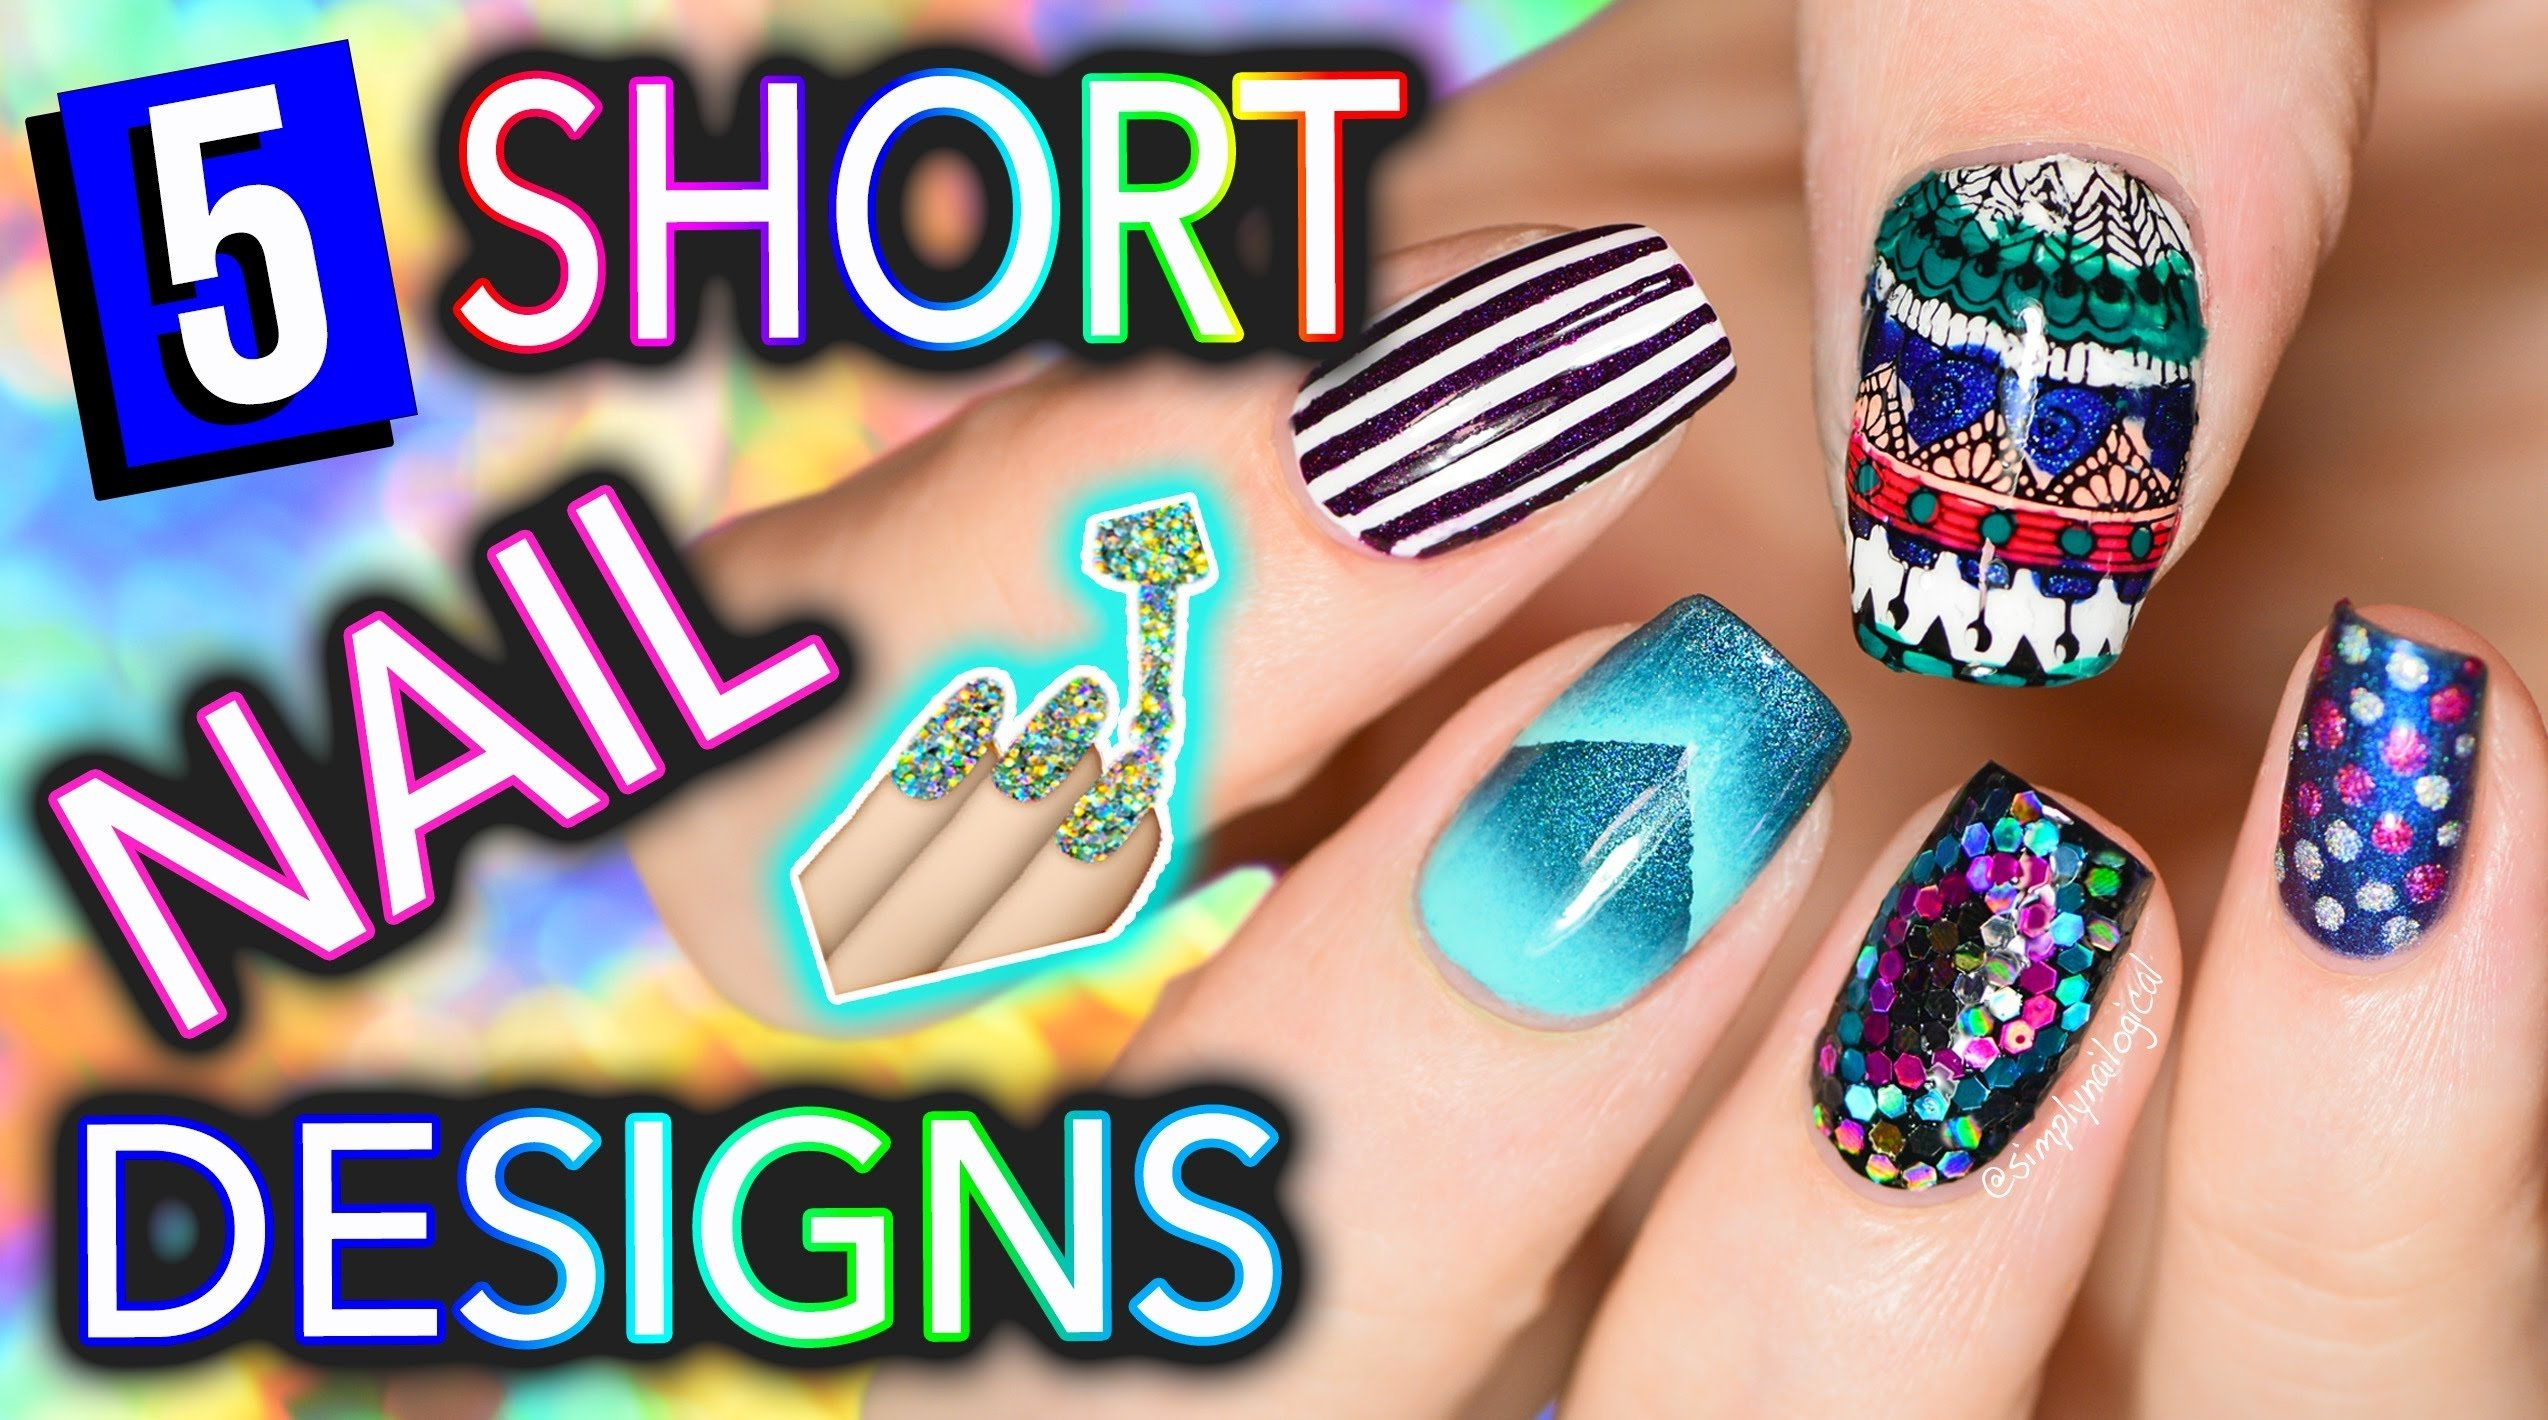 10 Perfect Nail Art Ideas For Short Nails